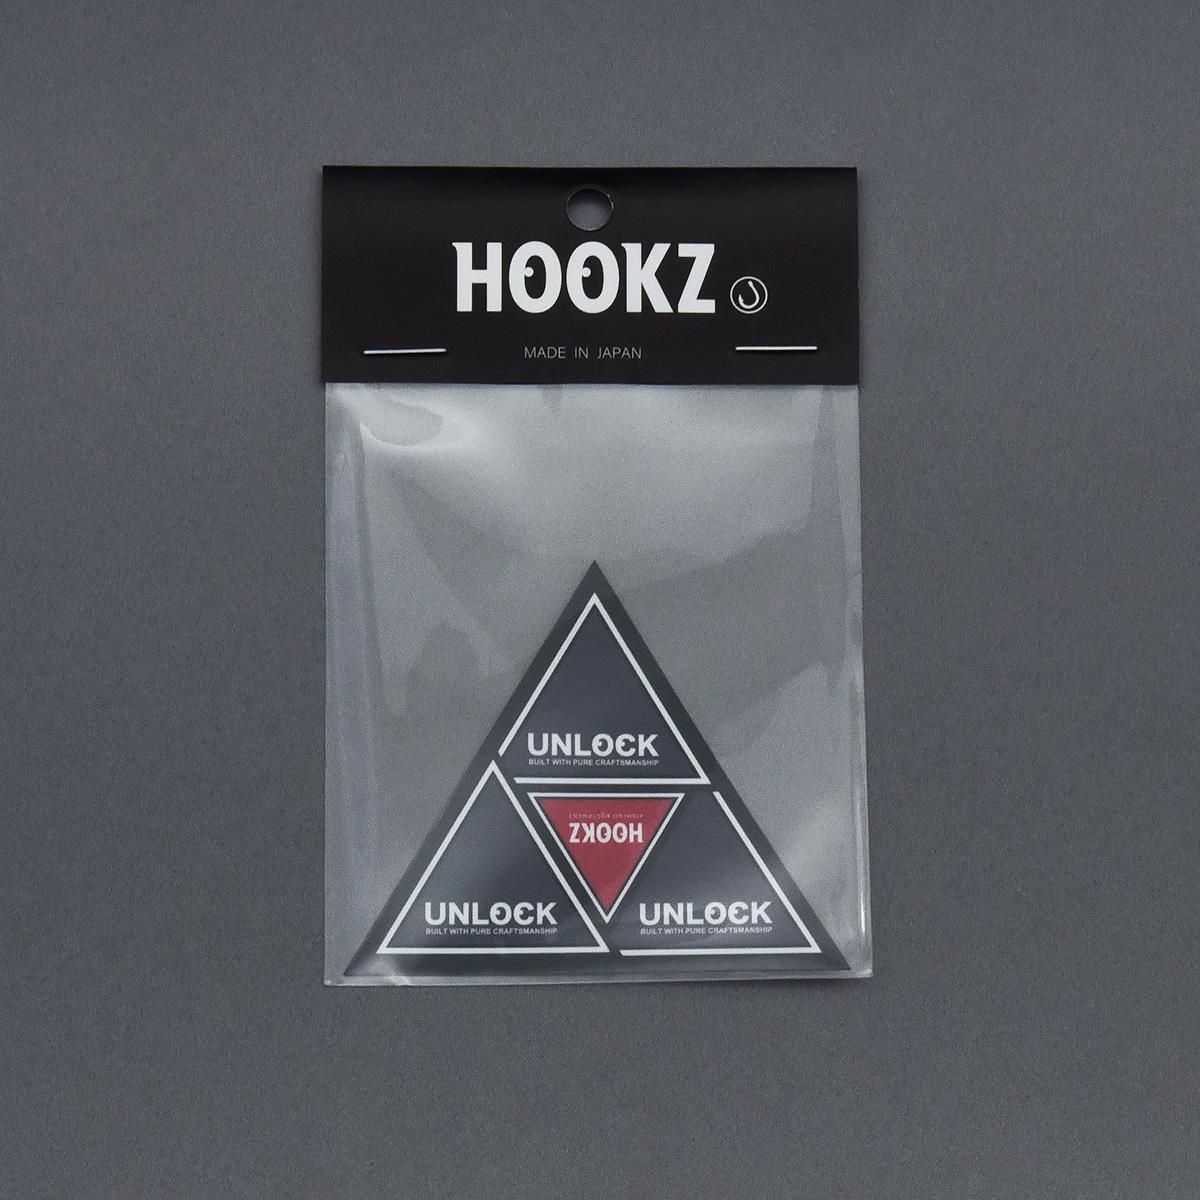 HOOKZ ピラミッドステッカーver.2